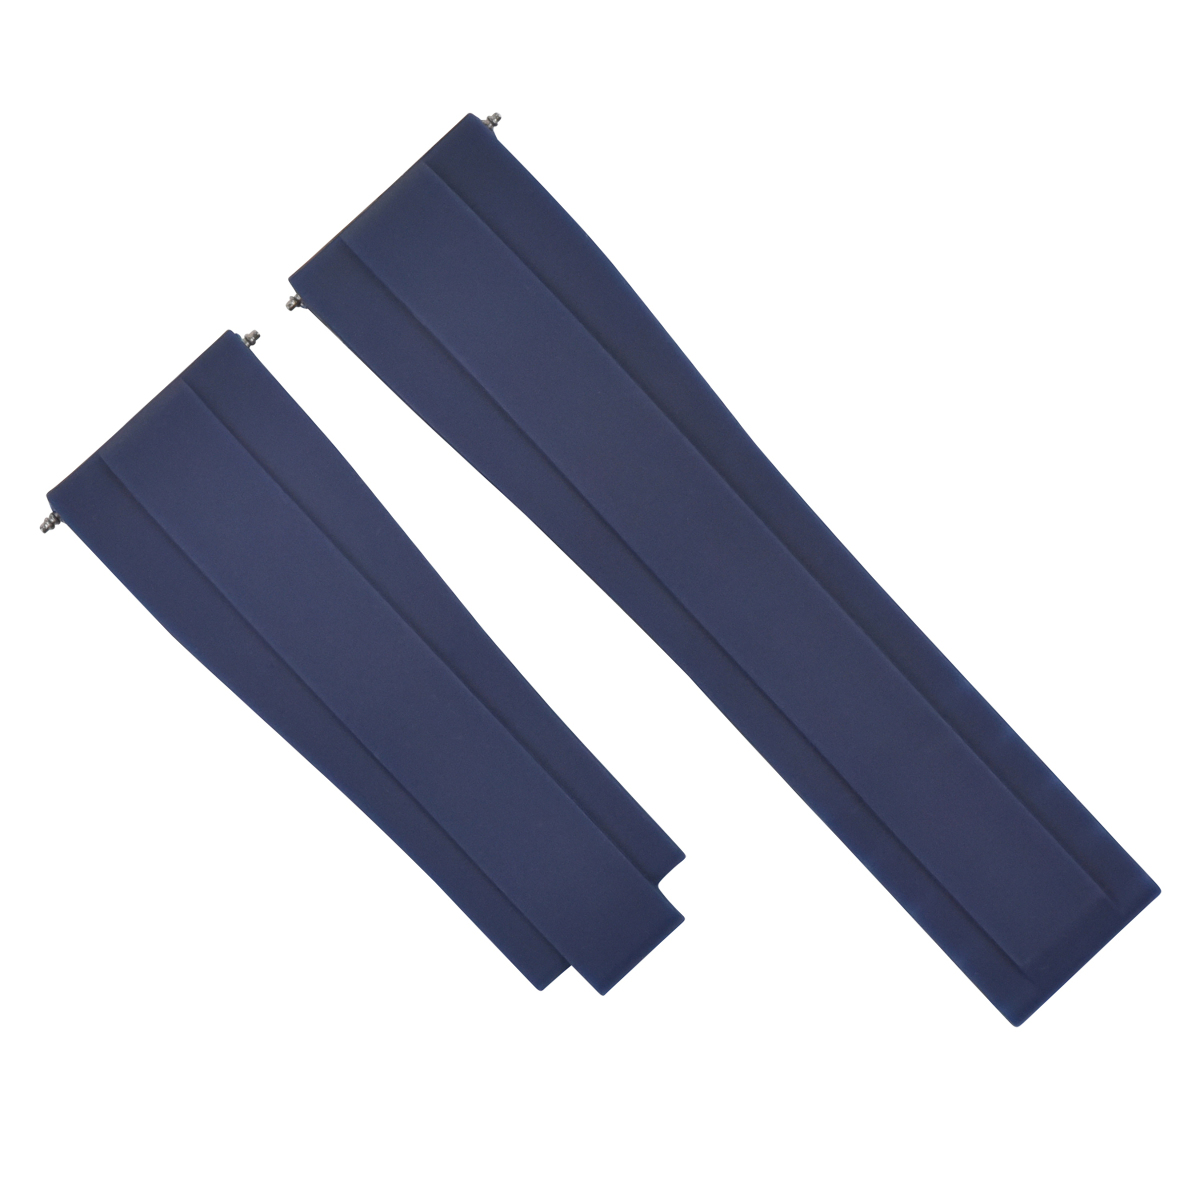 20MM RUBBER STRAP BAND FOR ROLEX DATEJUST DAYTONA SUBMARINER GMT BLUE